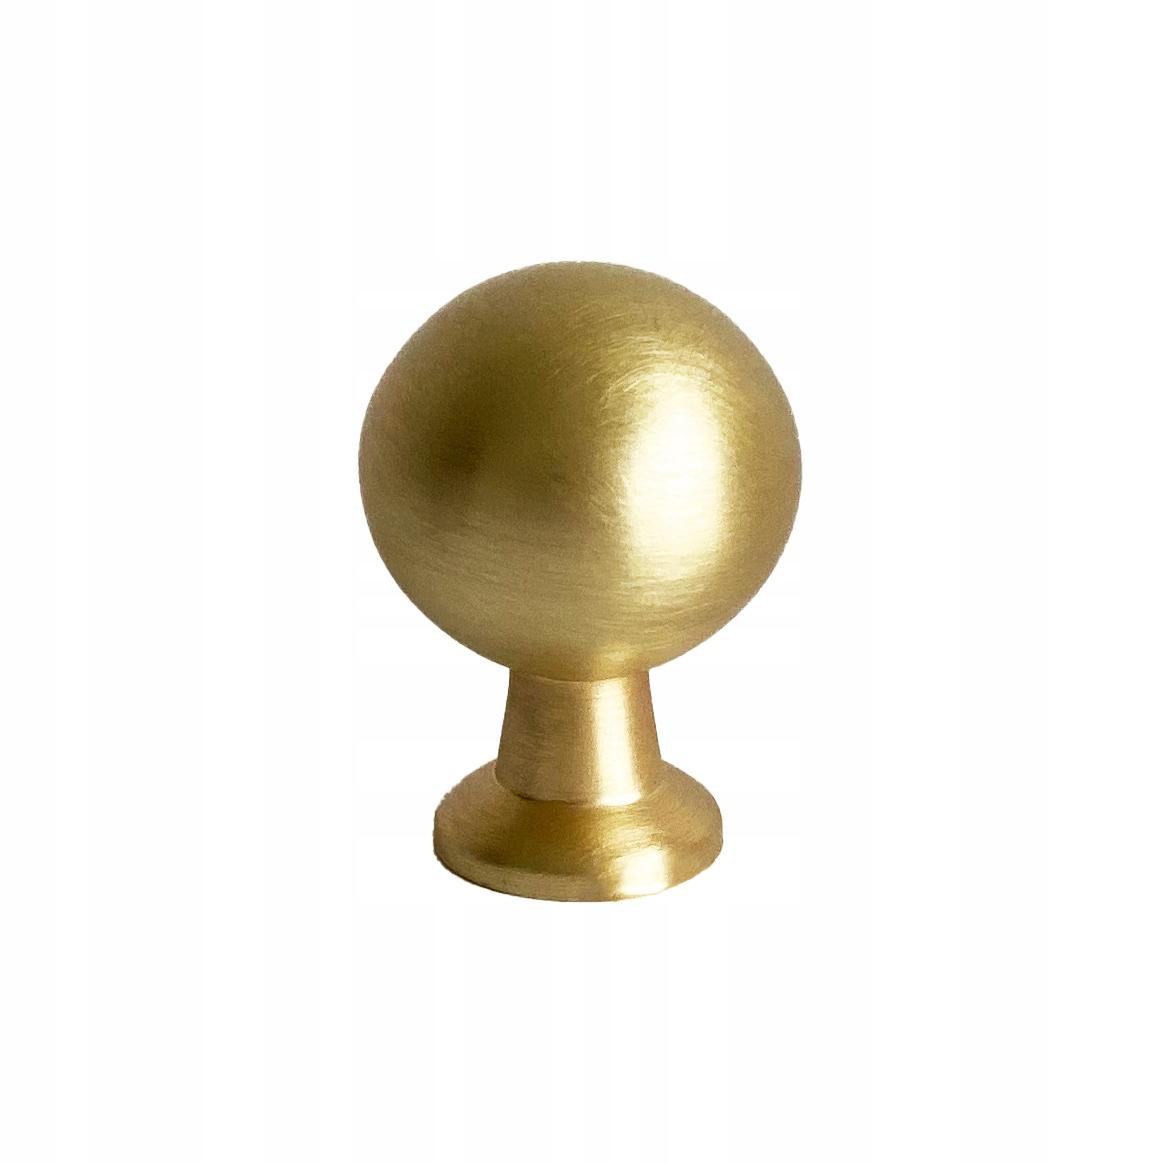 Ручка мебельная BALL gold